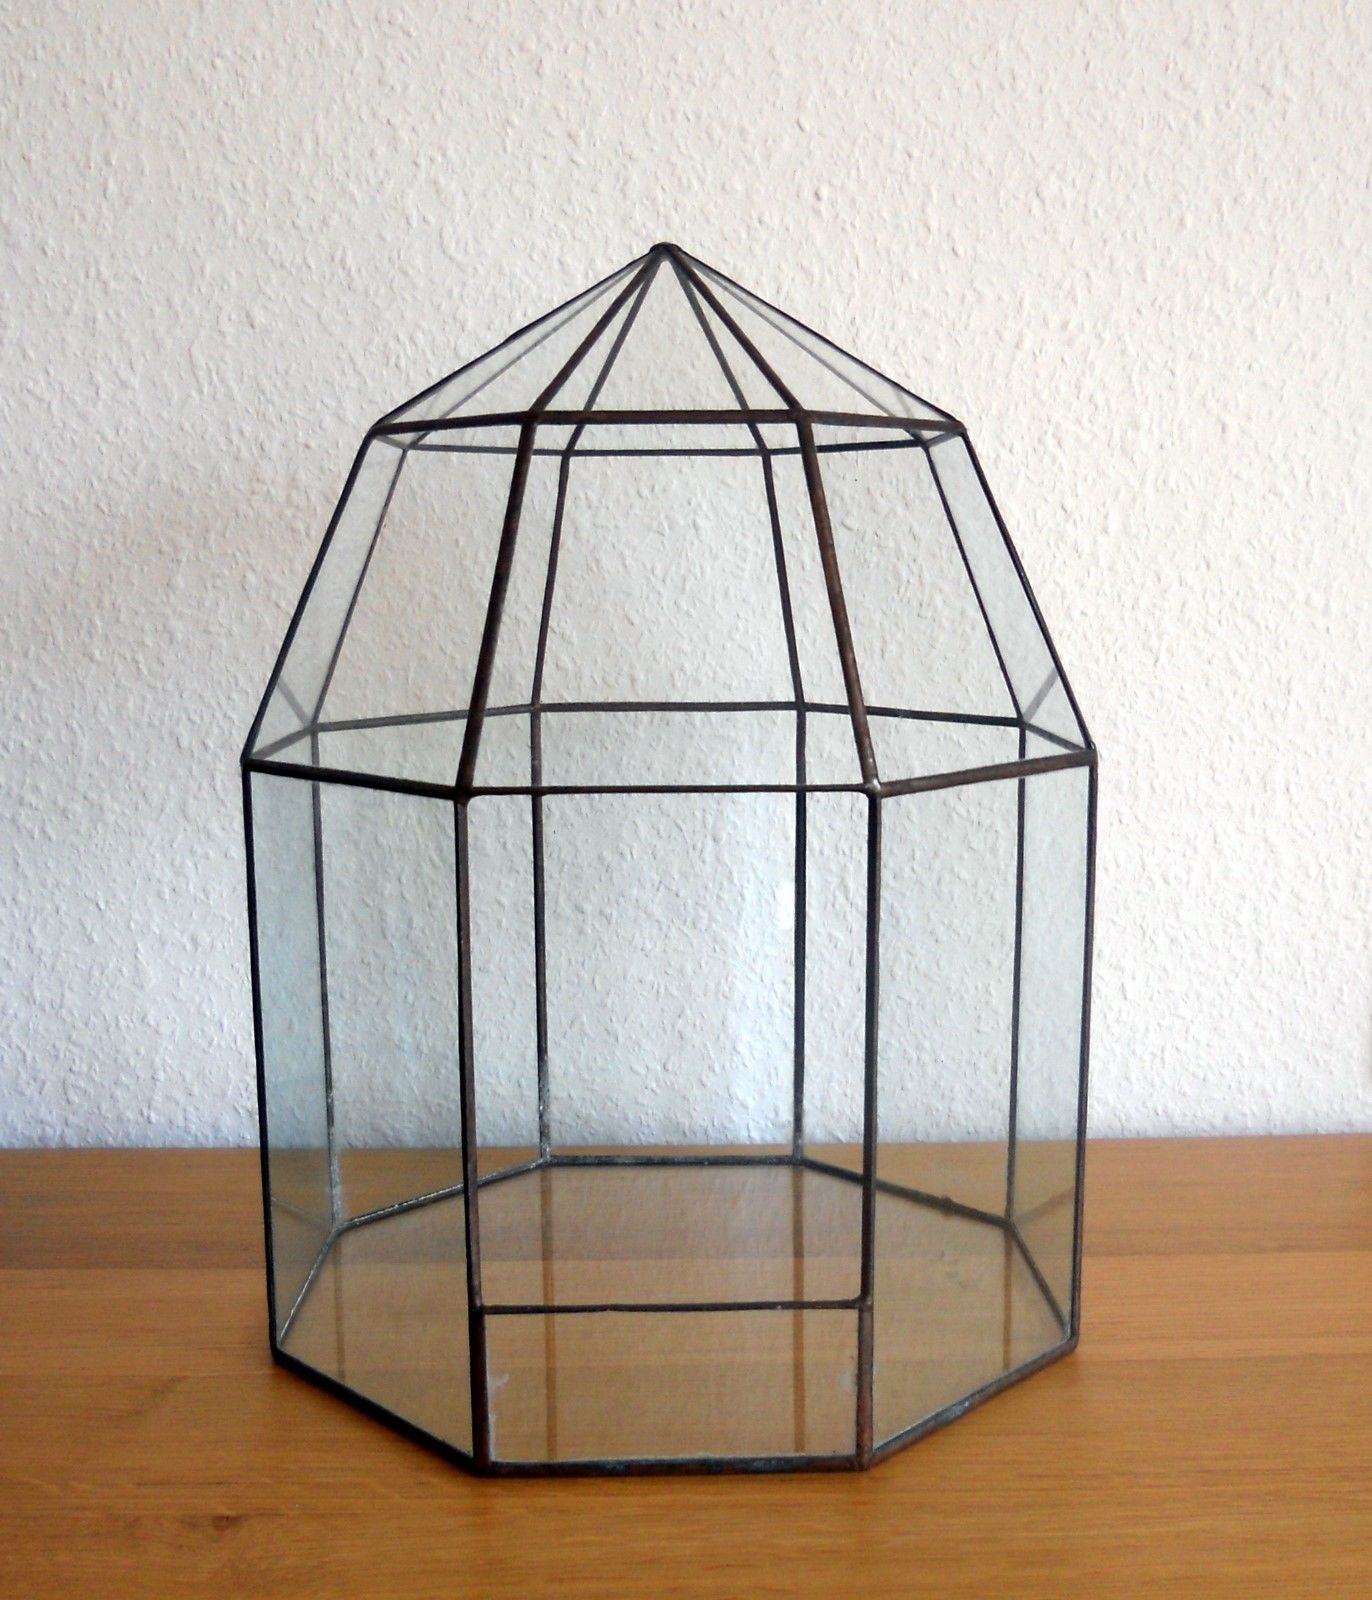 Bleiverglasung Deko-Glashaus Handarbeit Kakteen Pflanzen Terrarium Fiffany-Art